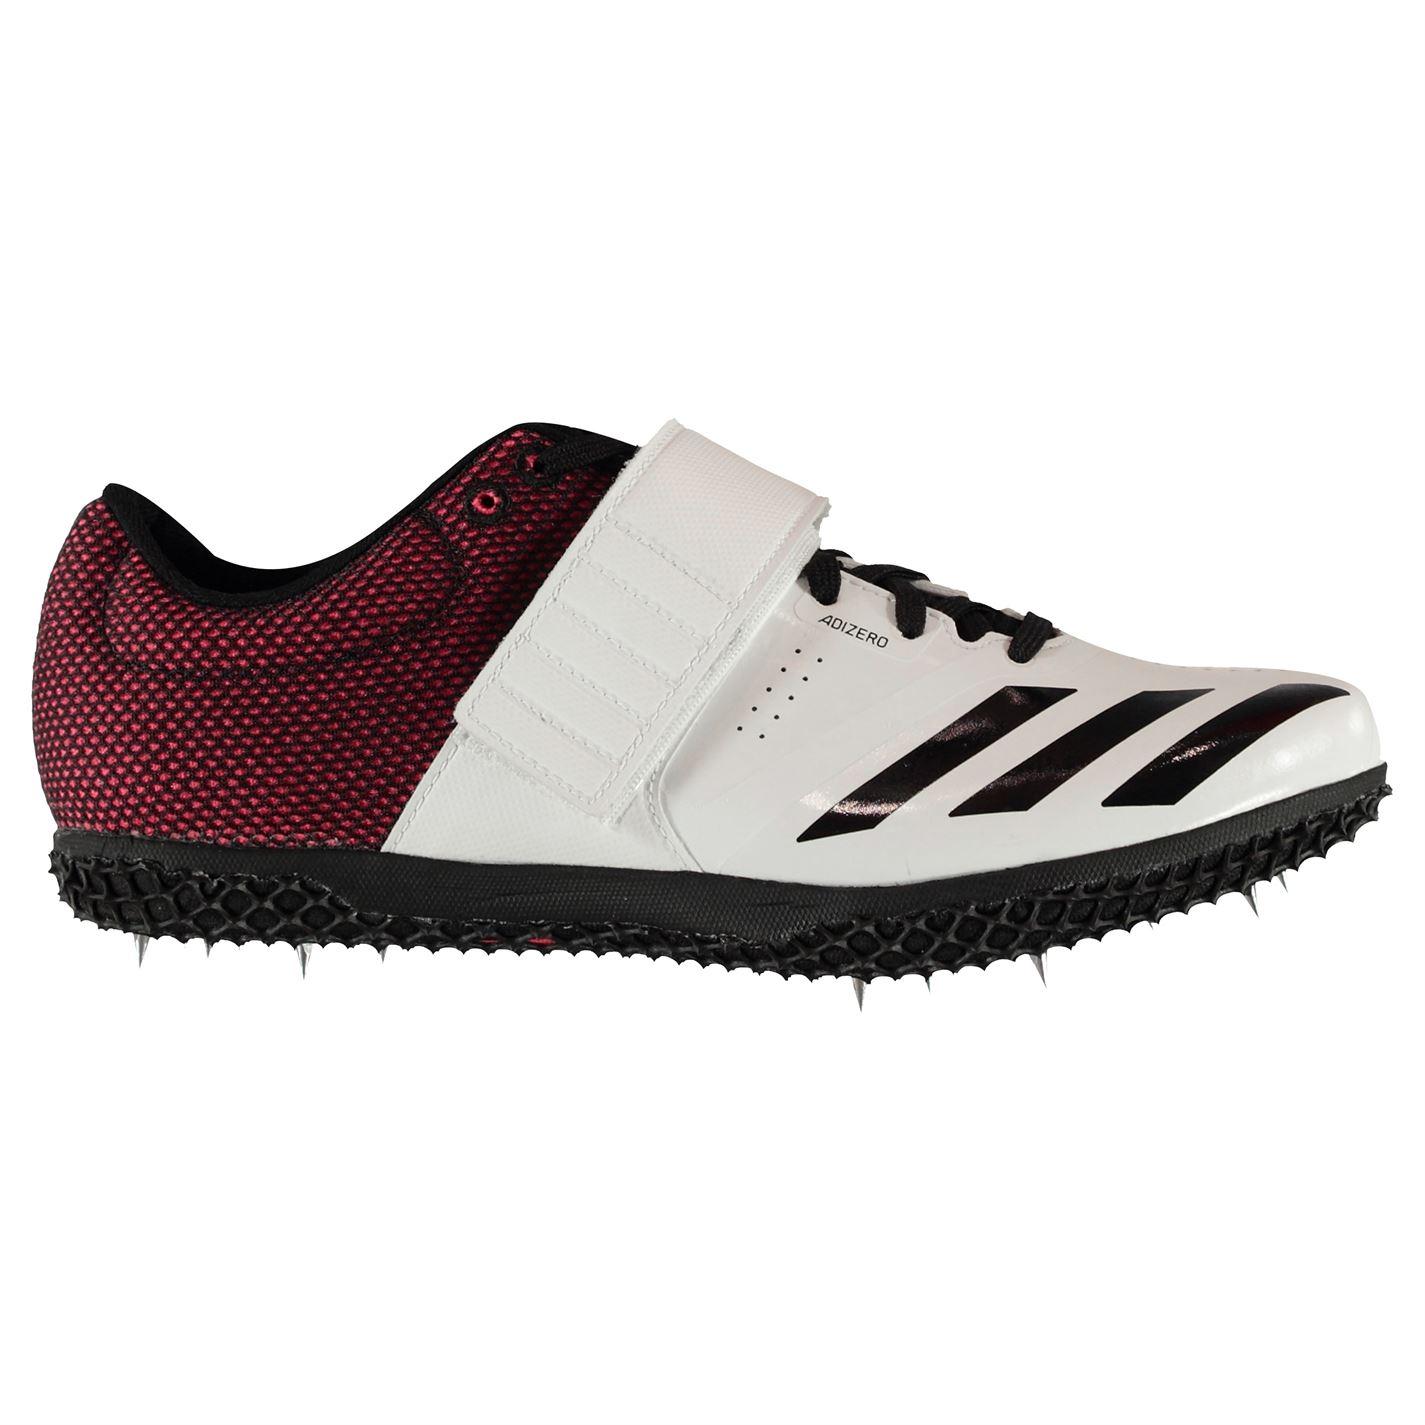 Adidas adizero HJ Sn94